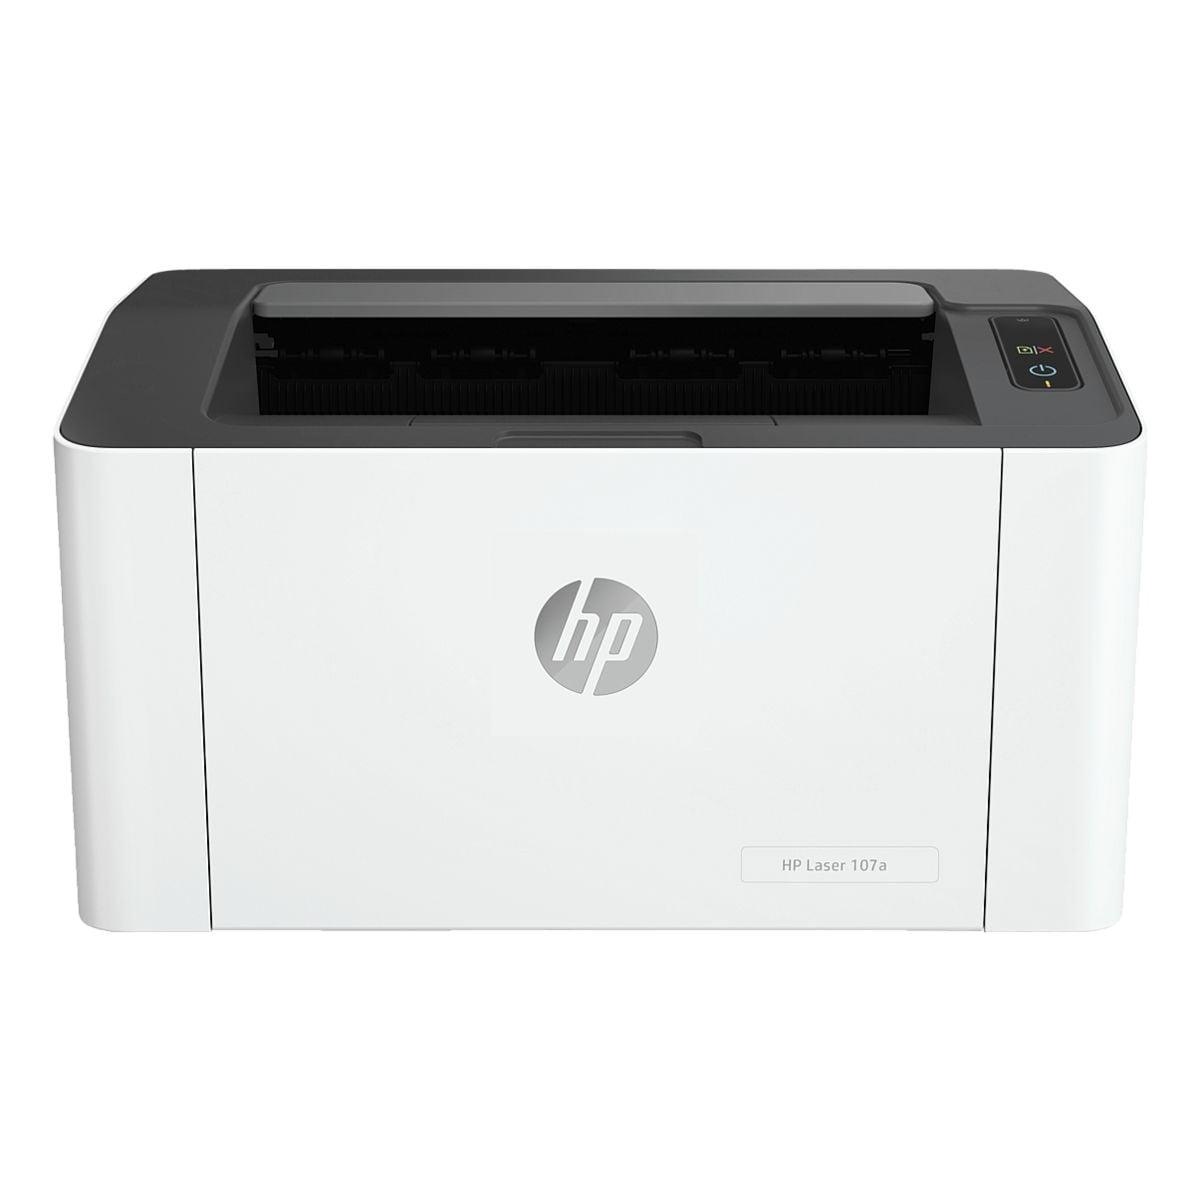 HP 107a Laserdrucker, A4 schwarz weiß Laserdrucker, 1200 x 1200 dpi